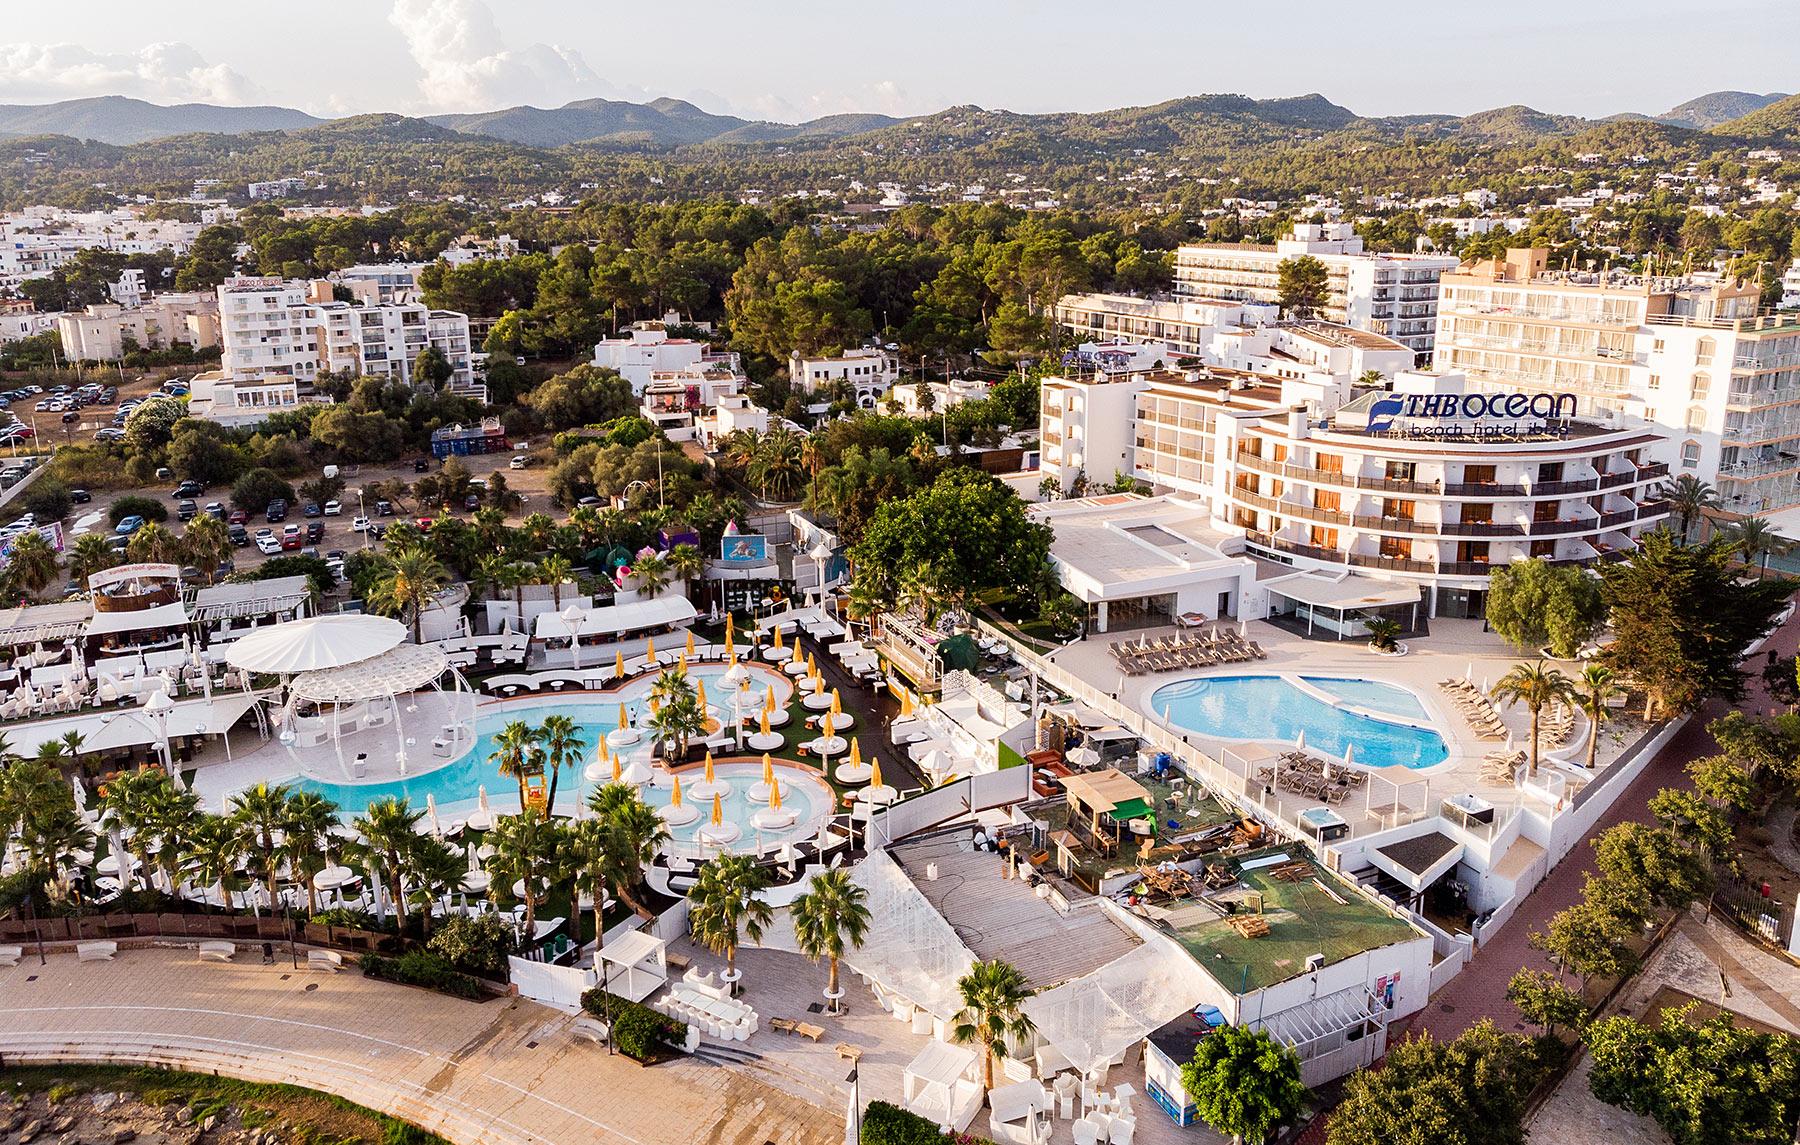 hotel thb ocean beach ibiza travel blog sunnyinga